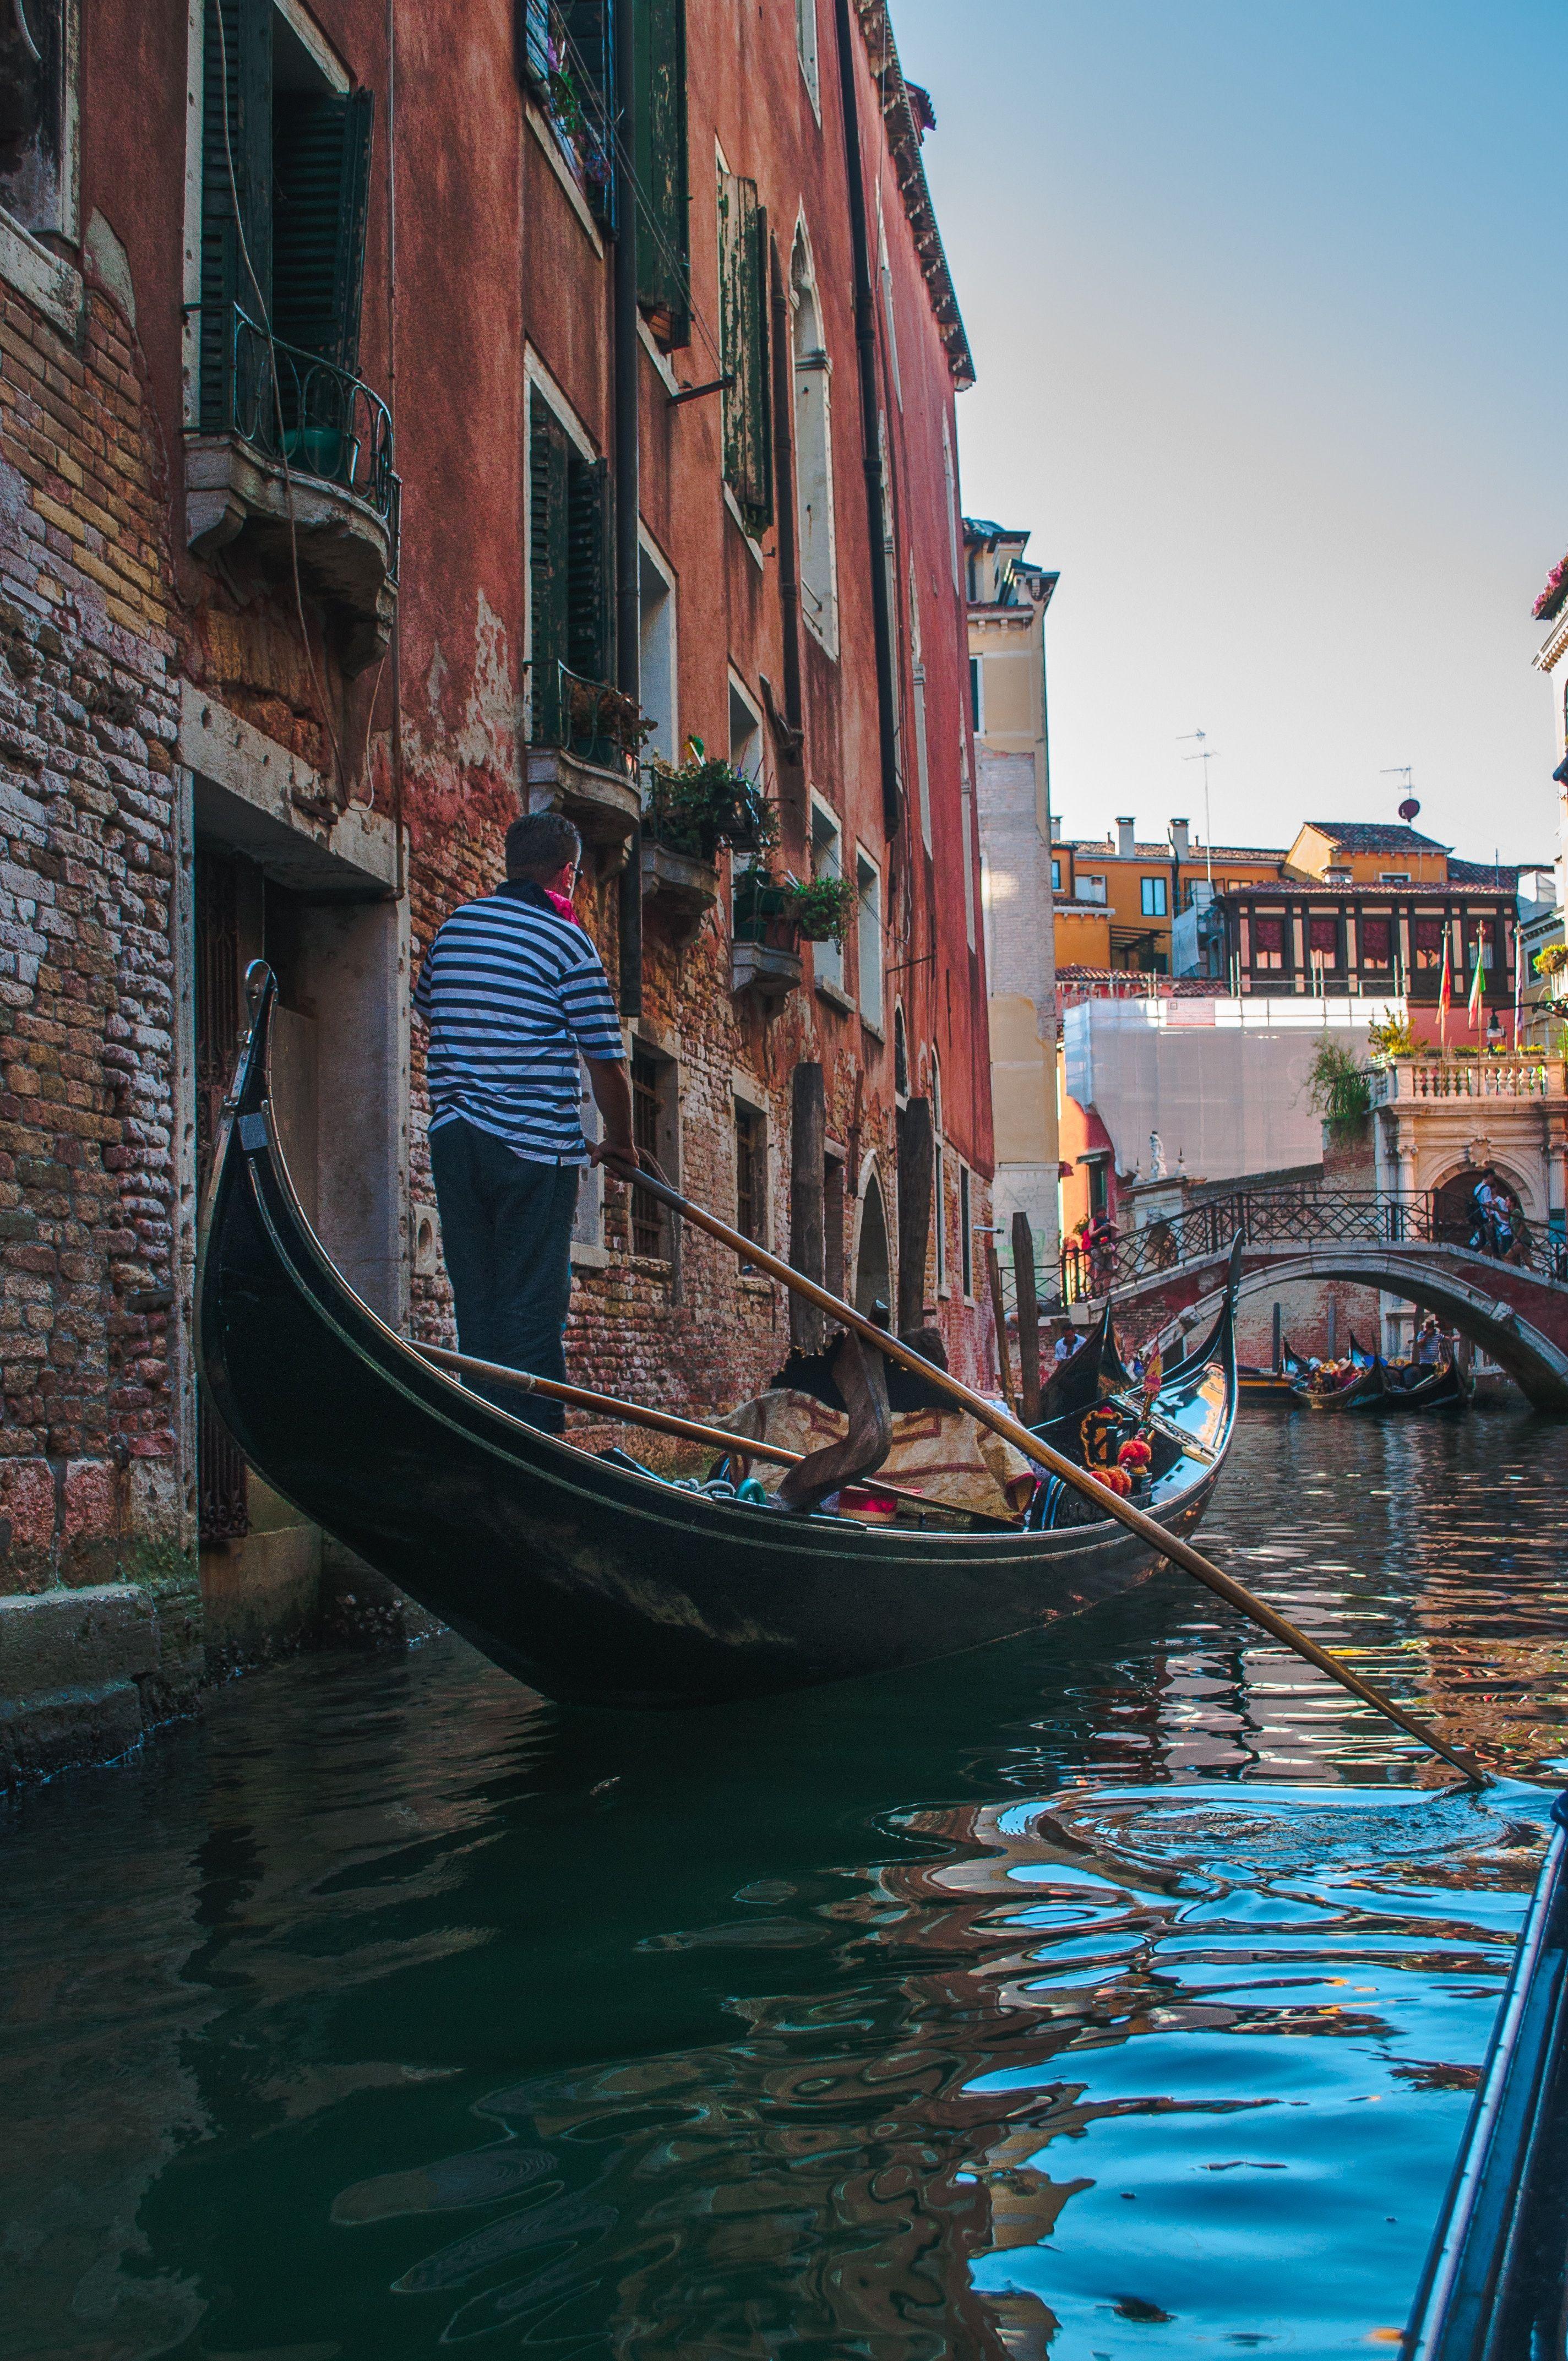 Metropolitan City Of Venice Italy Man